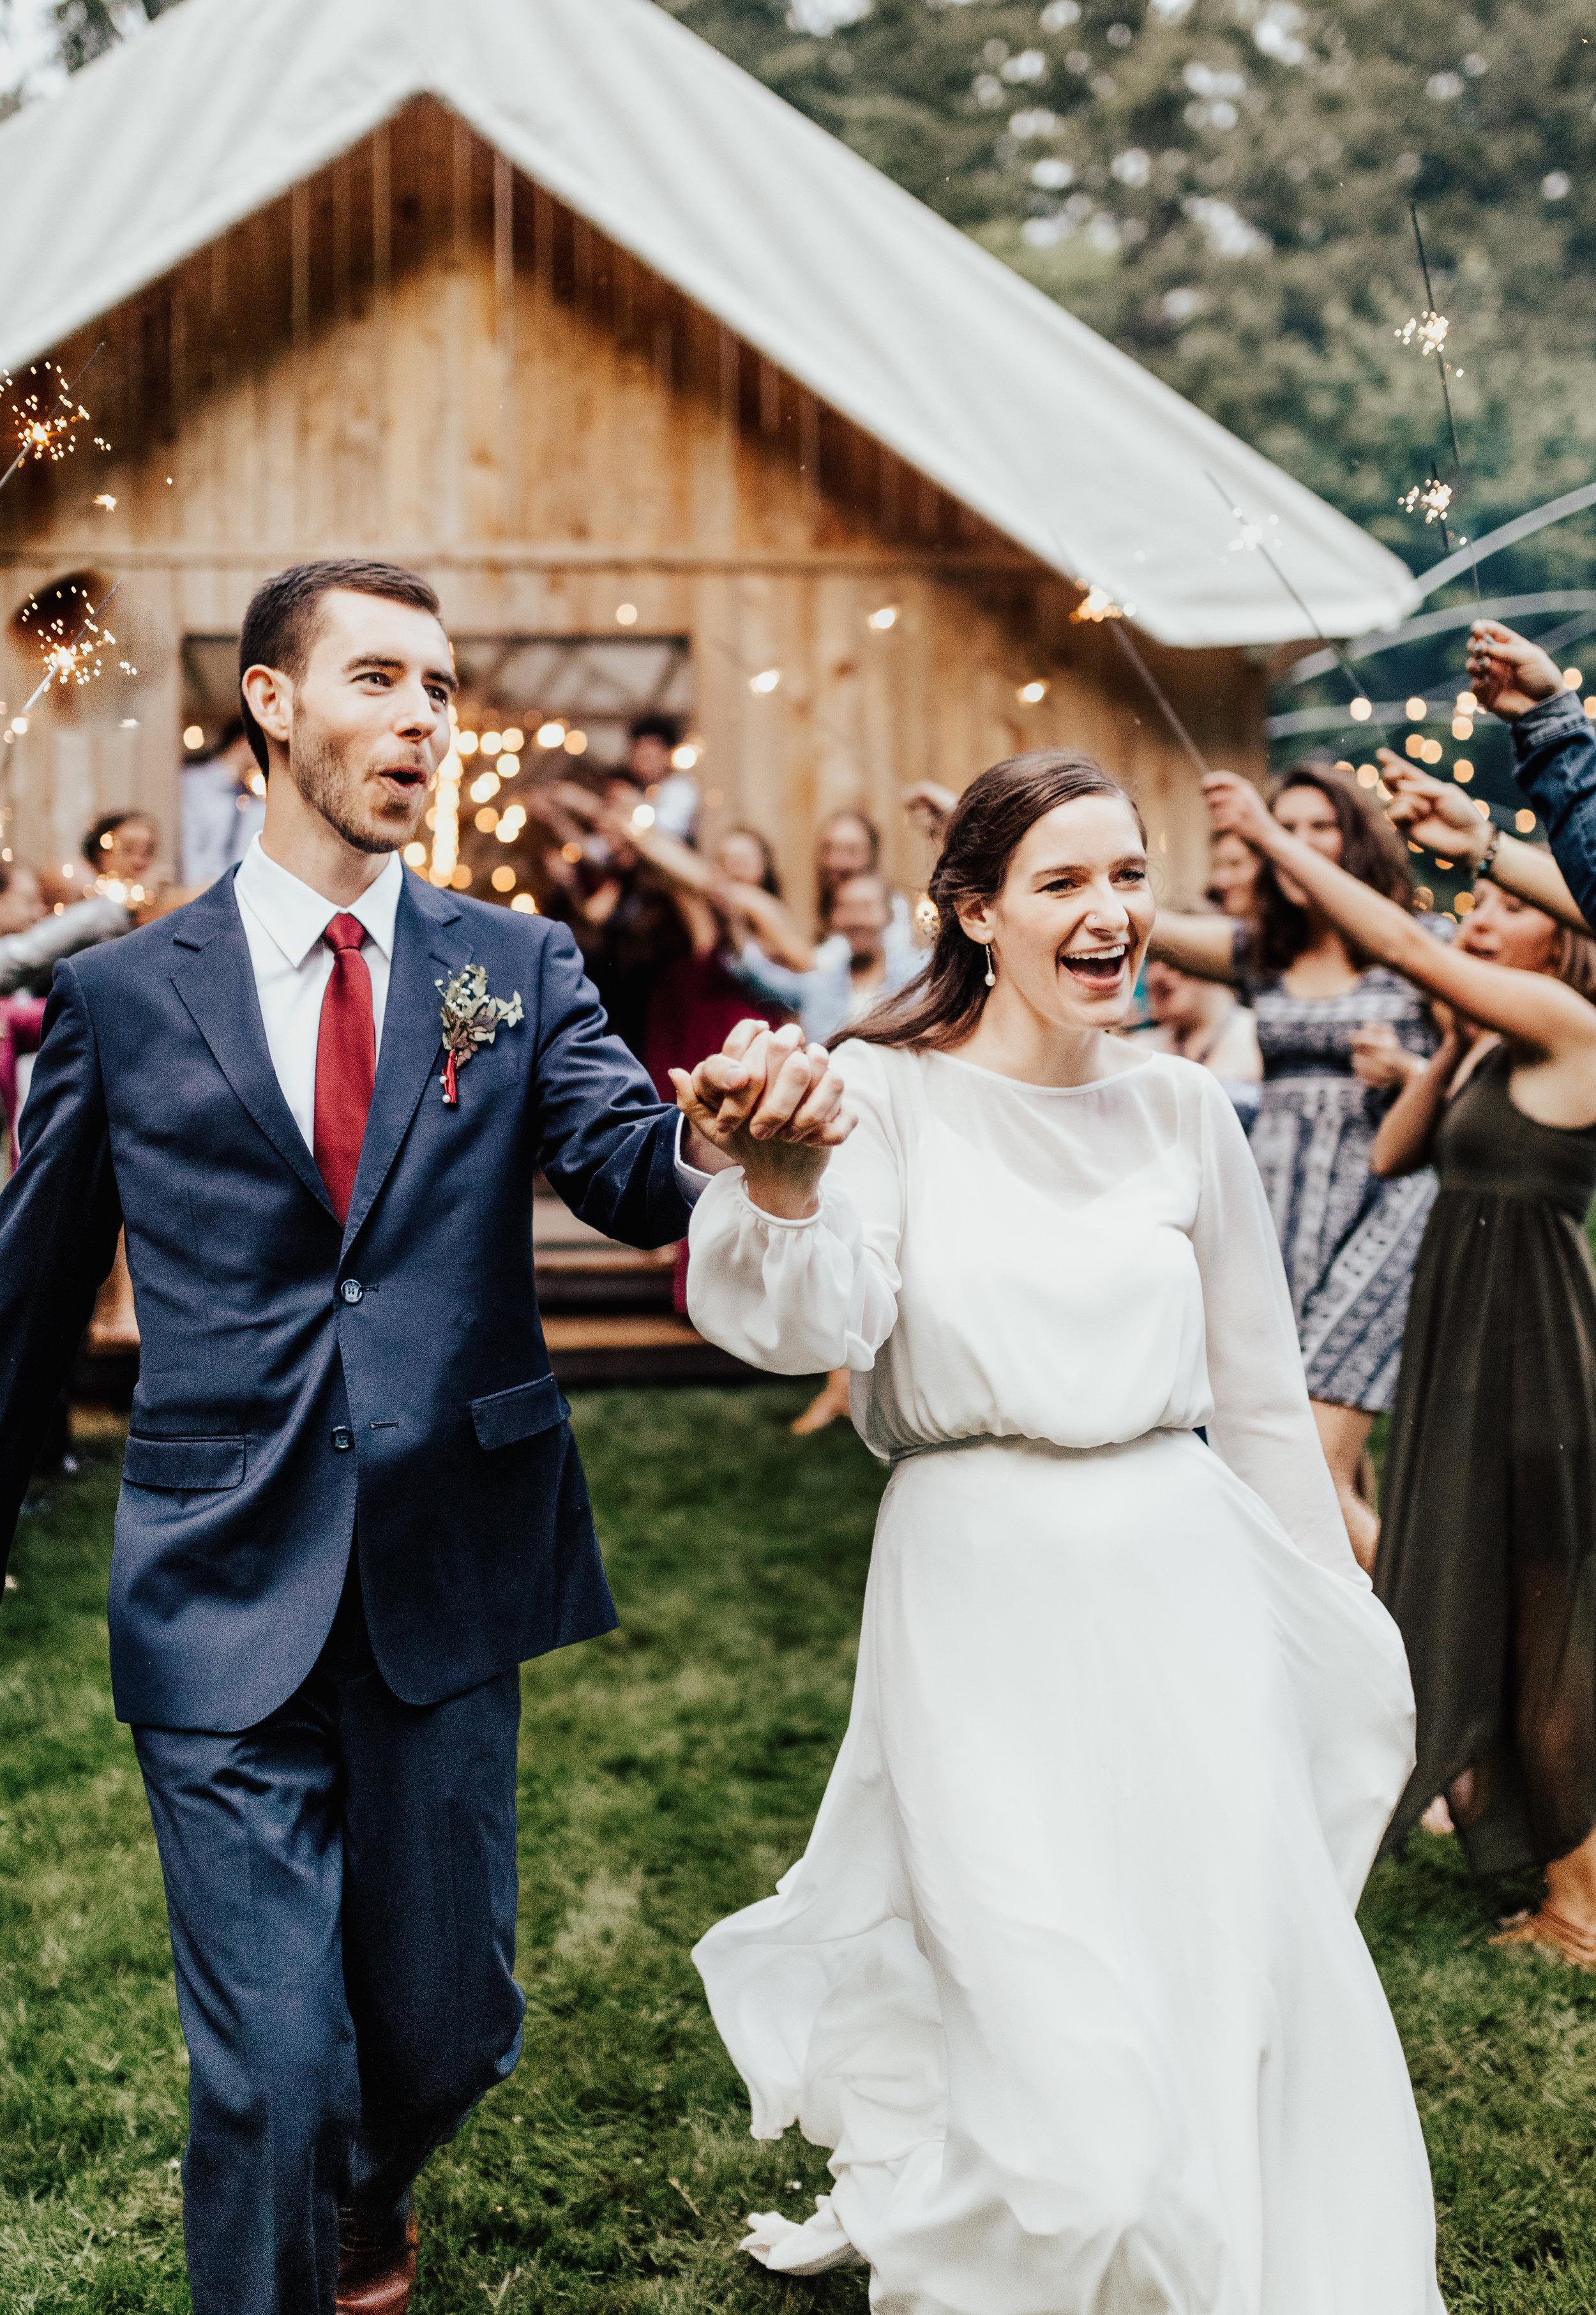 wedding_poulsbo_washington_elopement-17.jpg